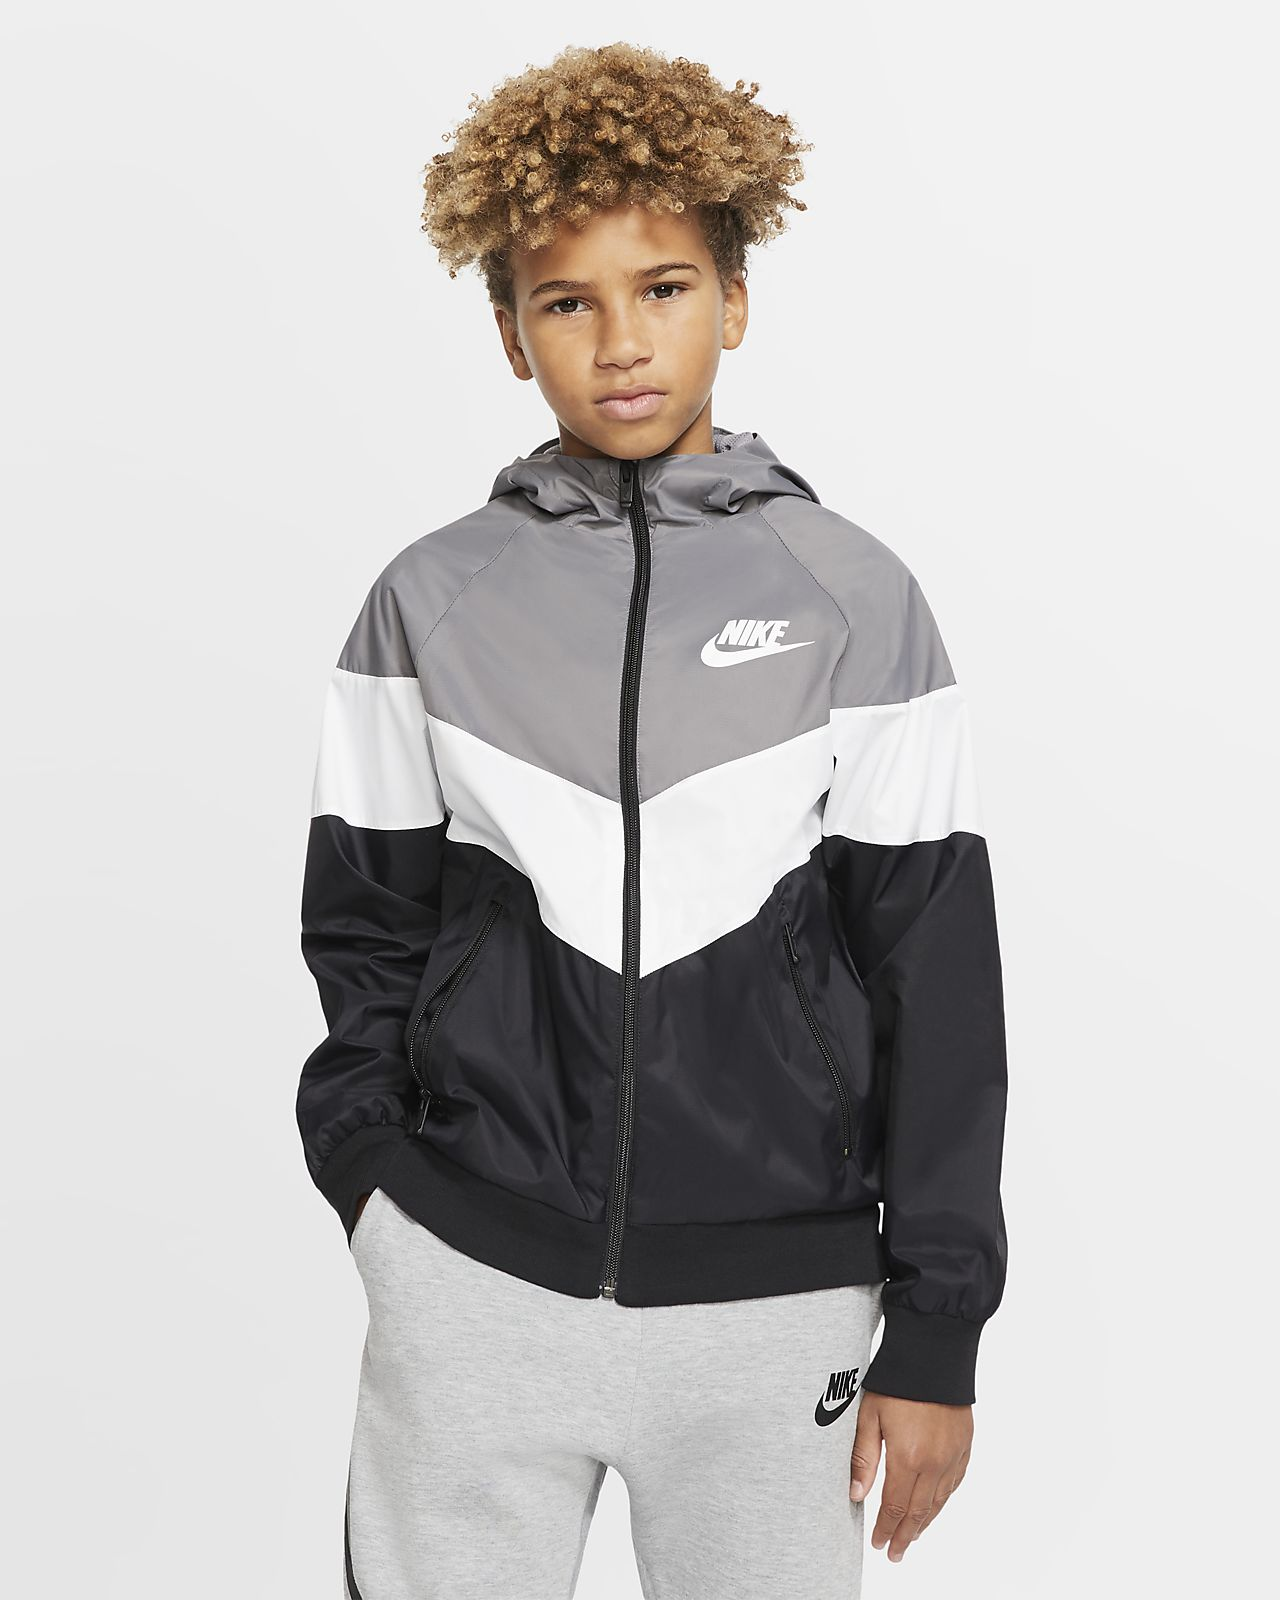 Nike Sportswear Windrunner Jacke für ältere Kinder